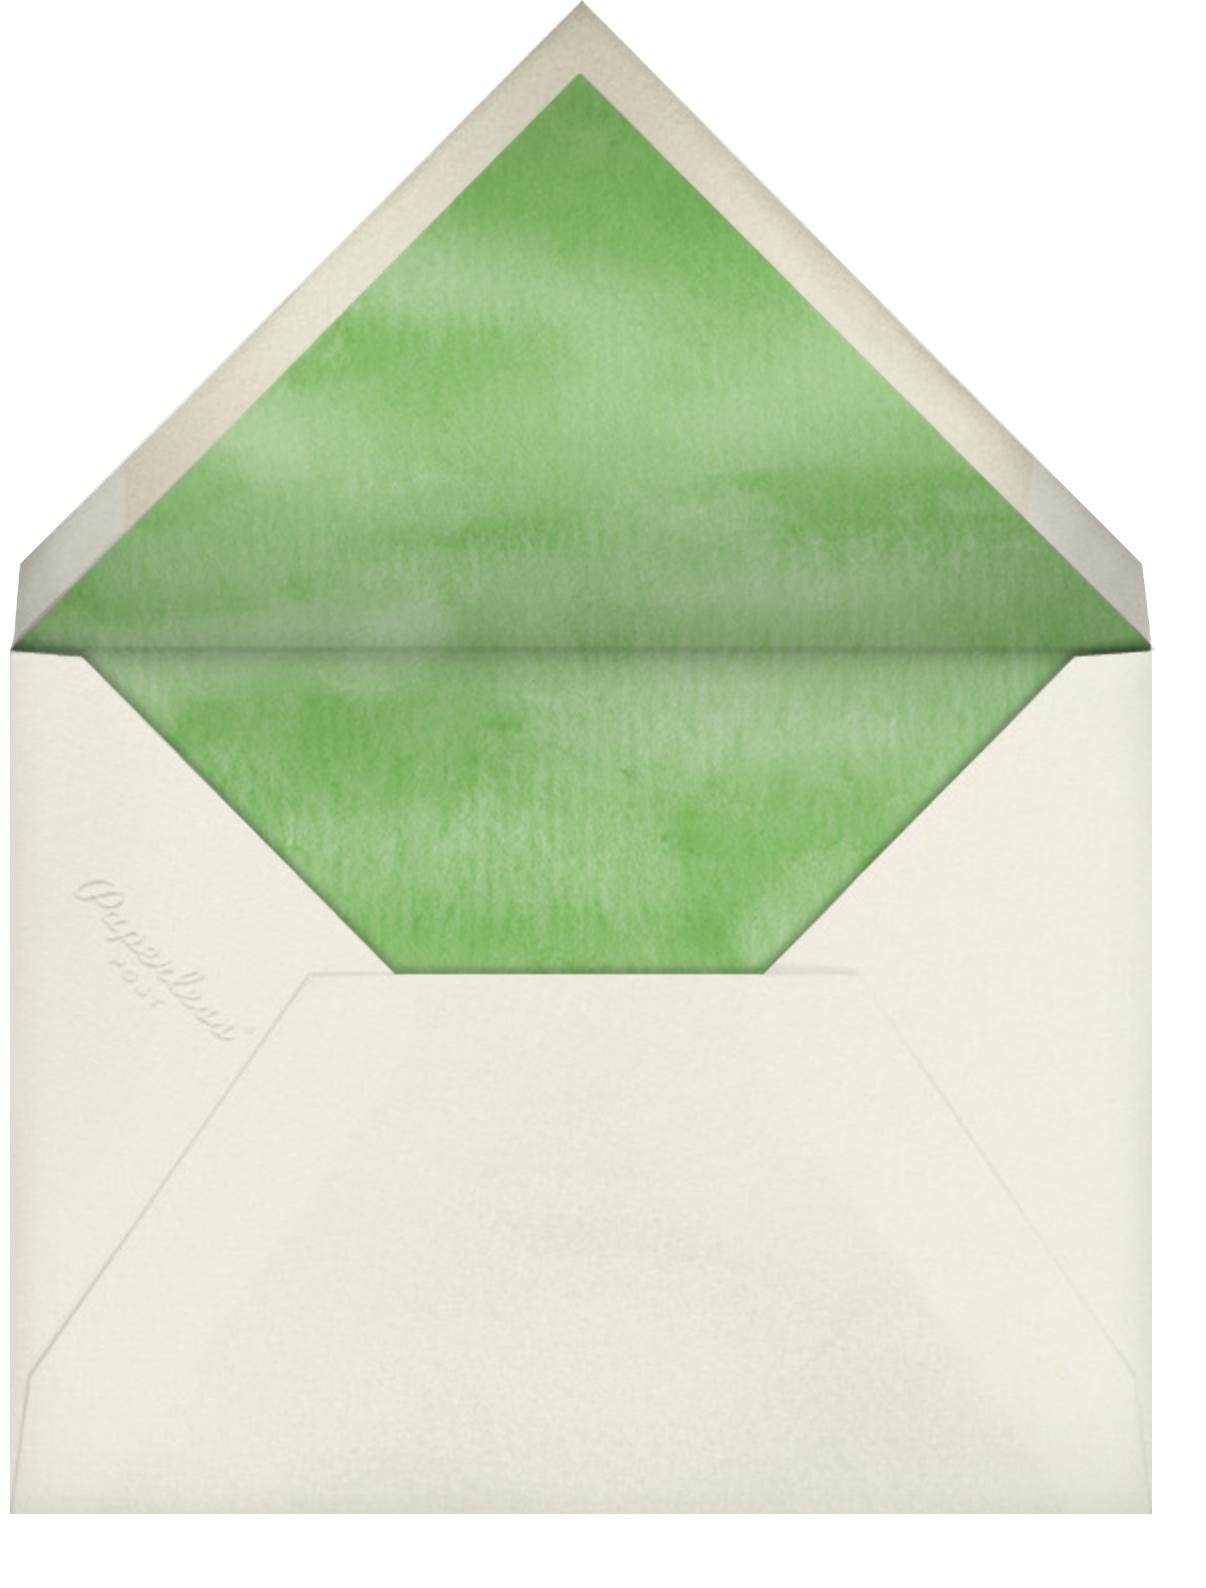 Nest Box - Felix Doolittle - Envelope